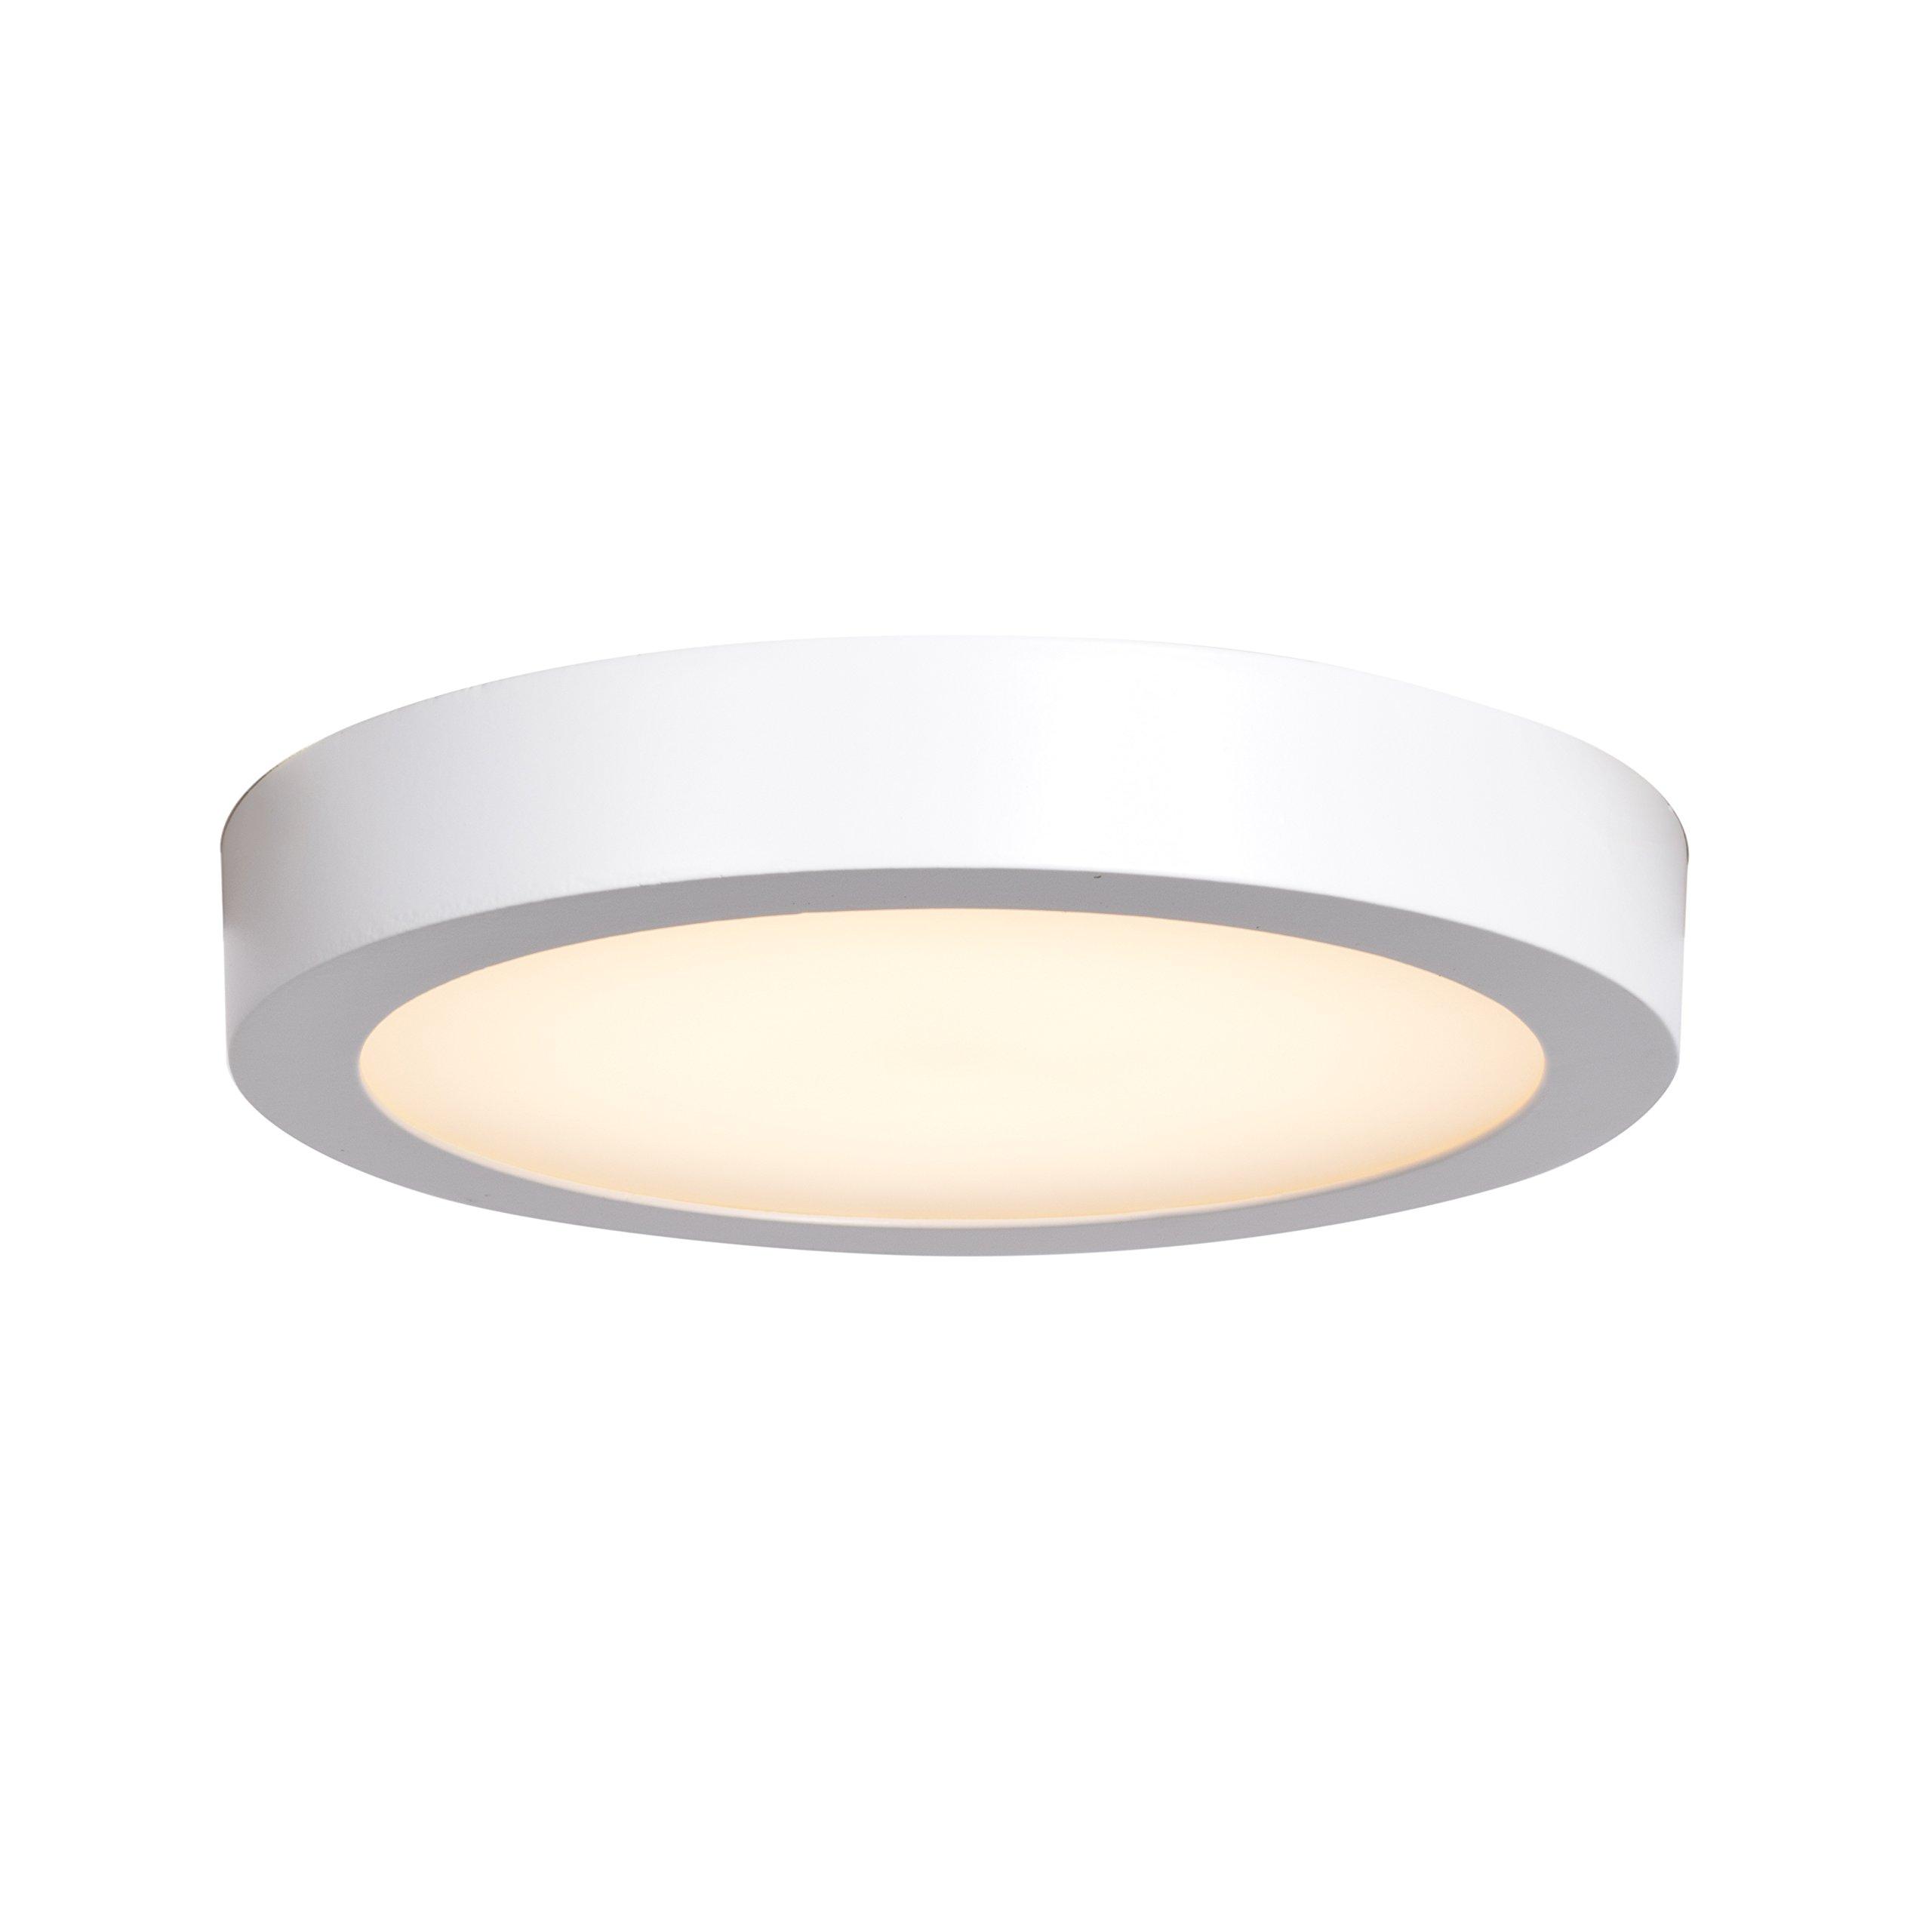 Ulko Exterior LED Outdoor Flush Mount - 9'' D - White - Acrylic Lens Diffuser